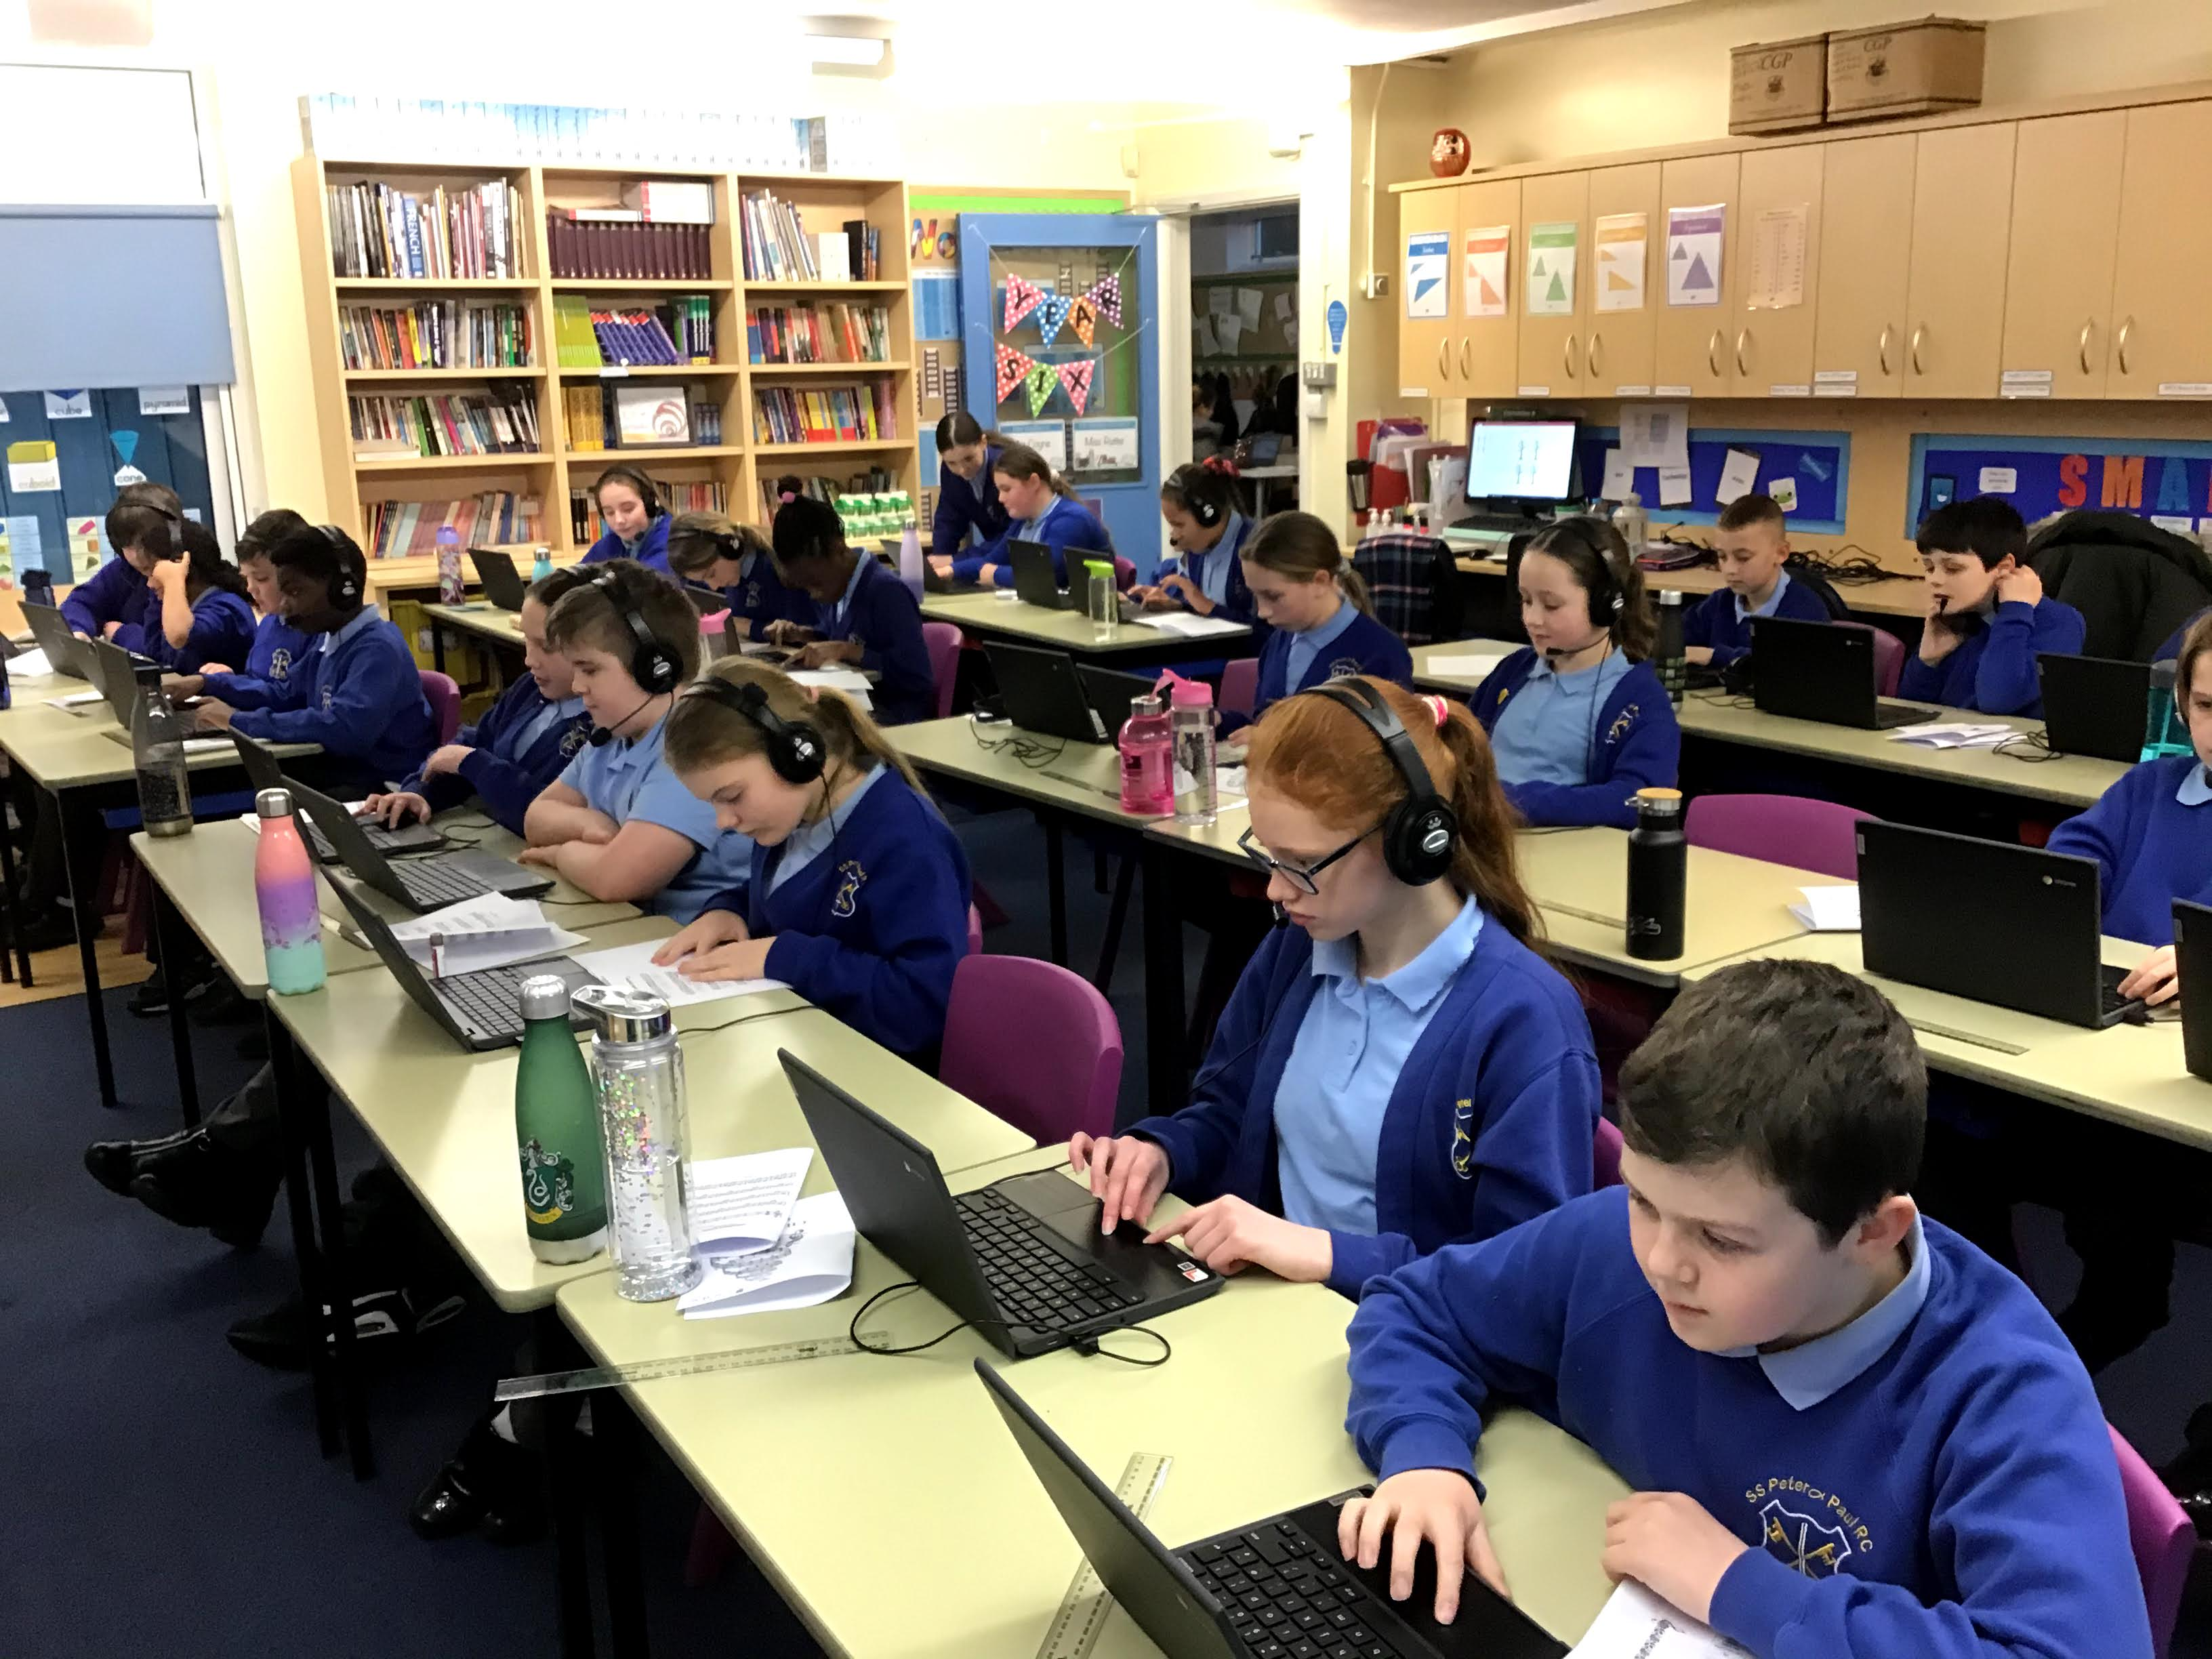 School children on laptops